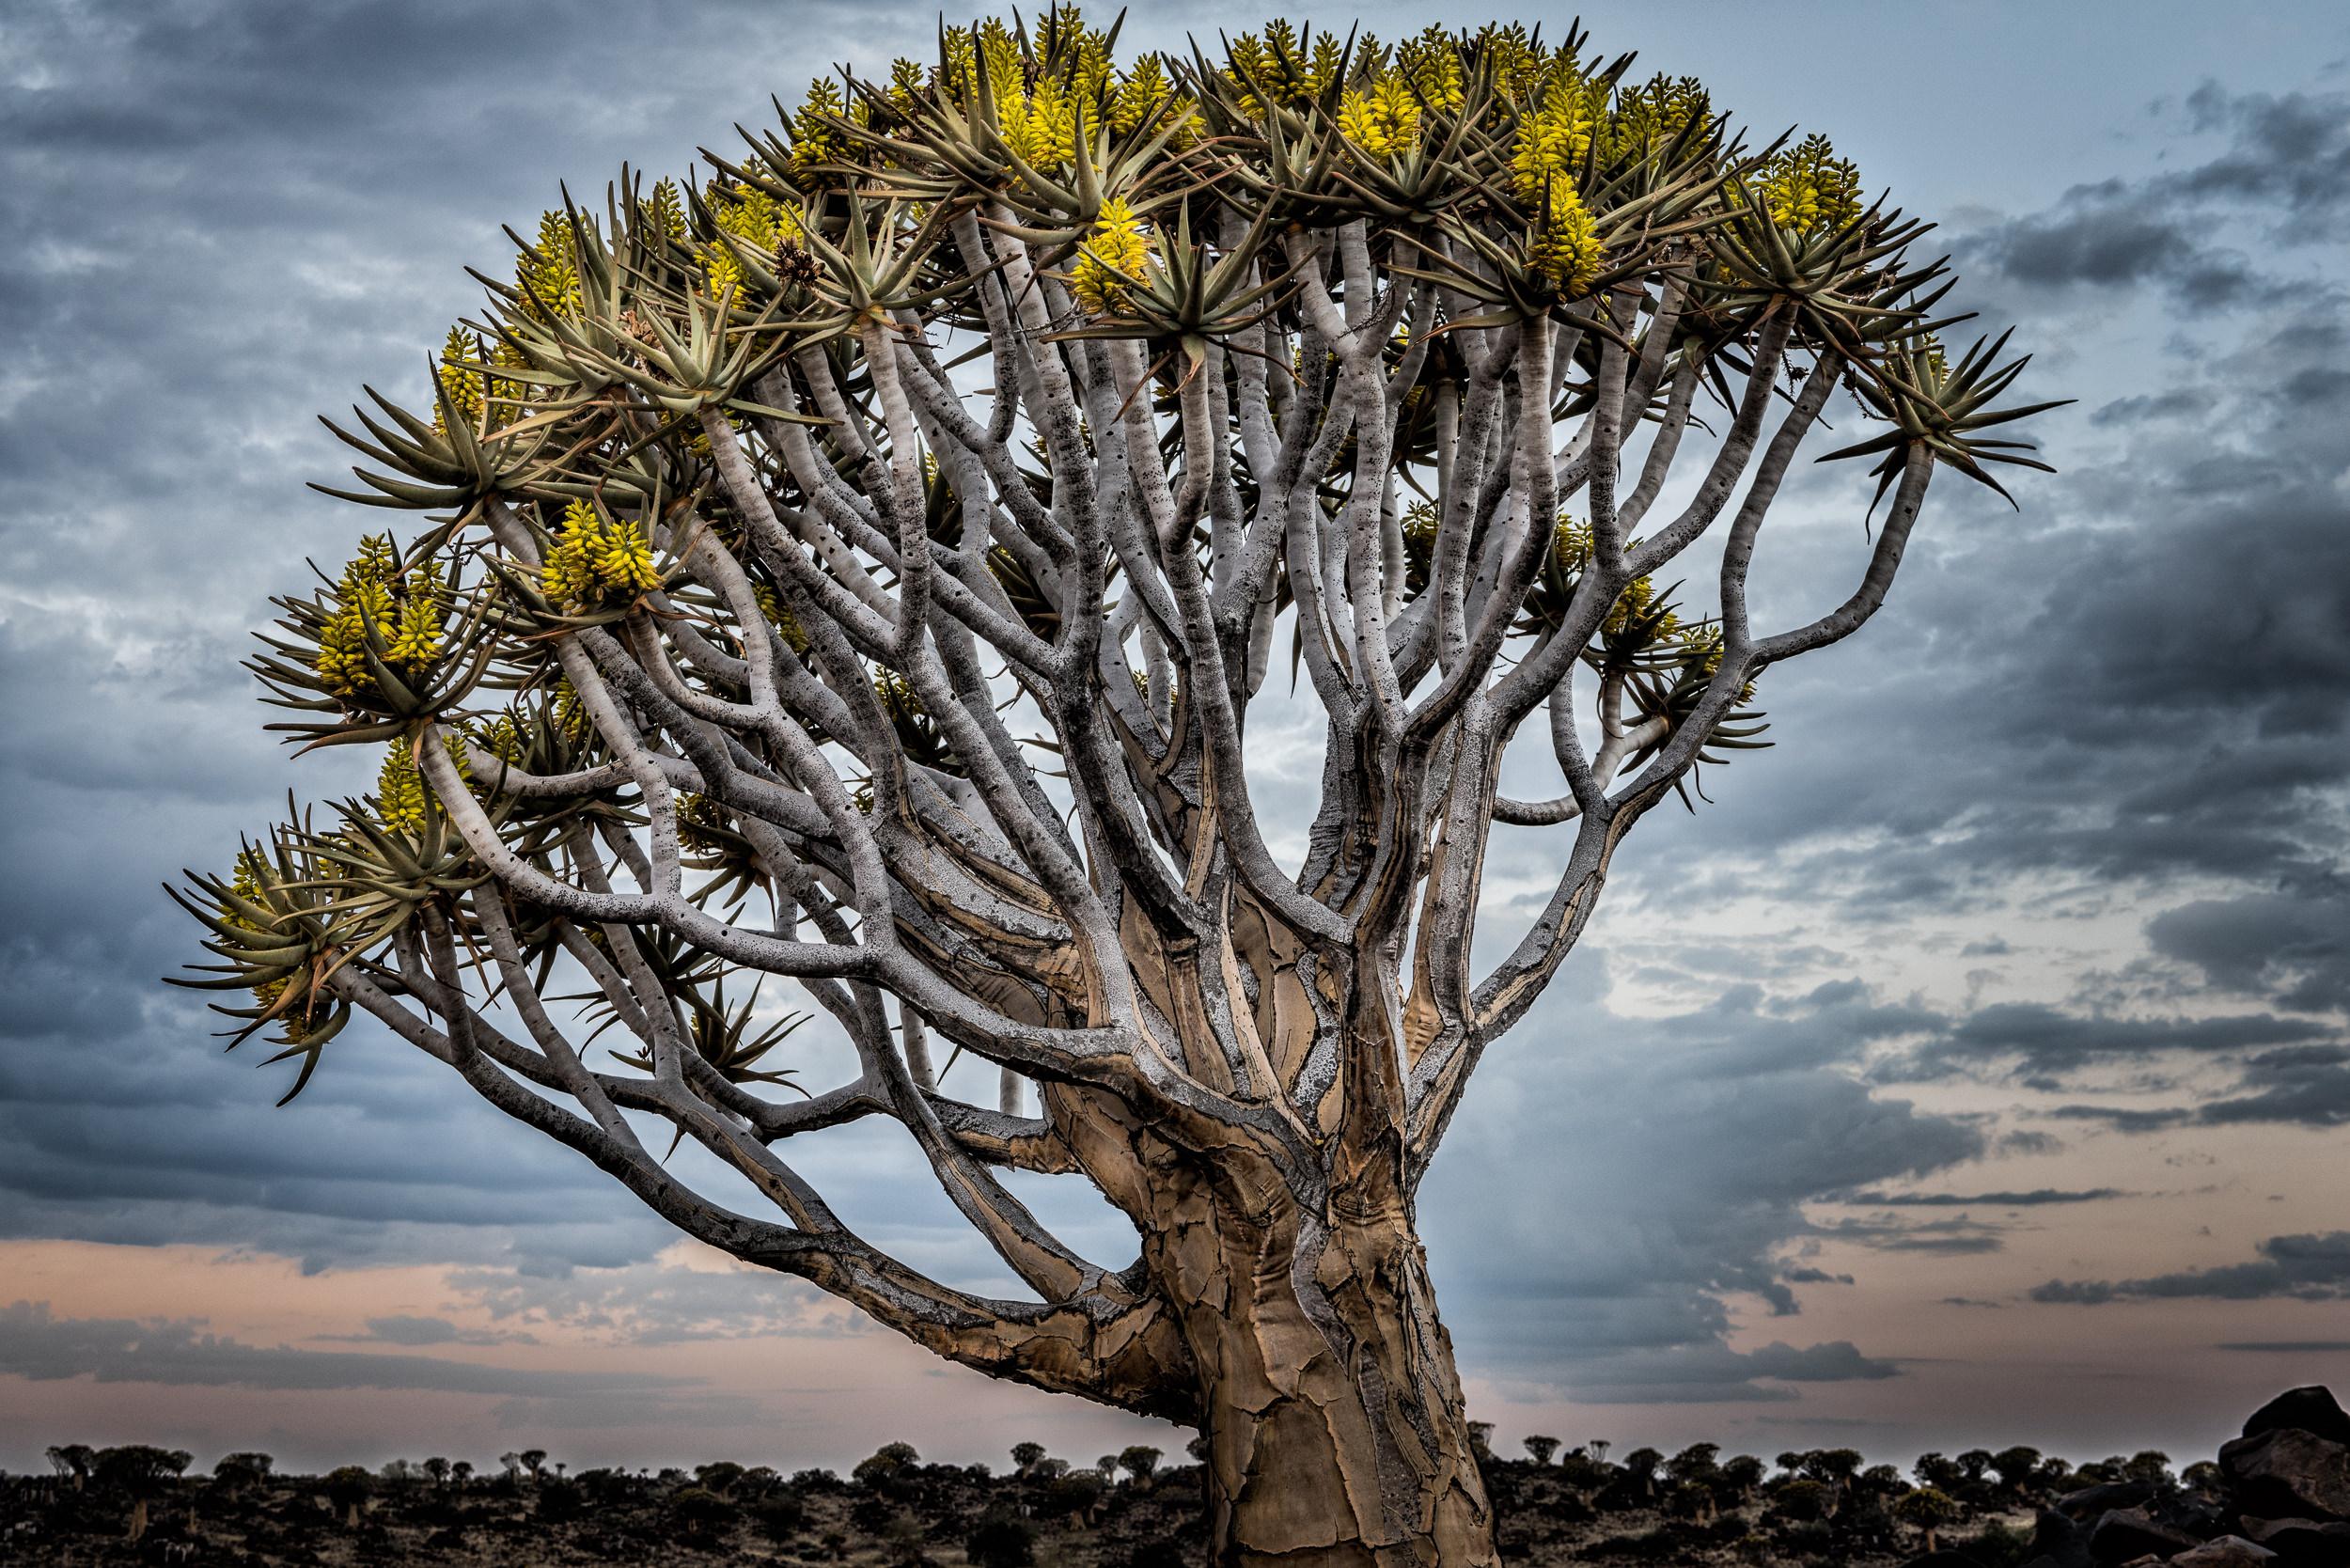 [2016 06 08] Namibia Quiver Trees (NIKON D810) 9119-Edit.jpg